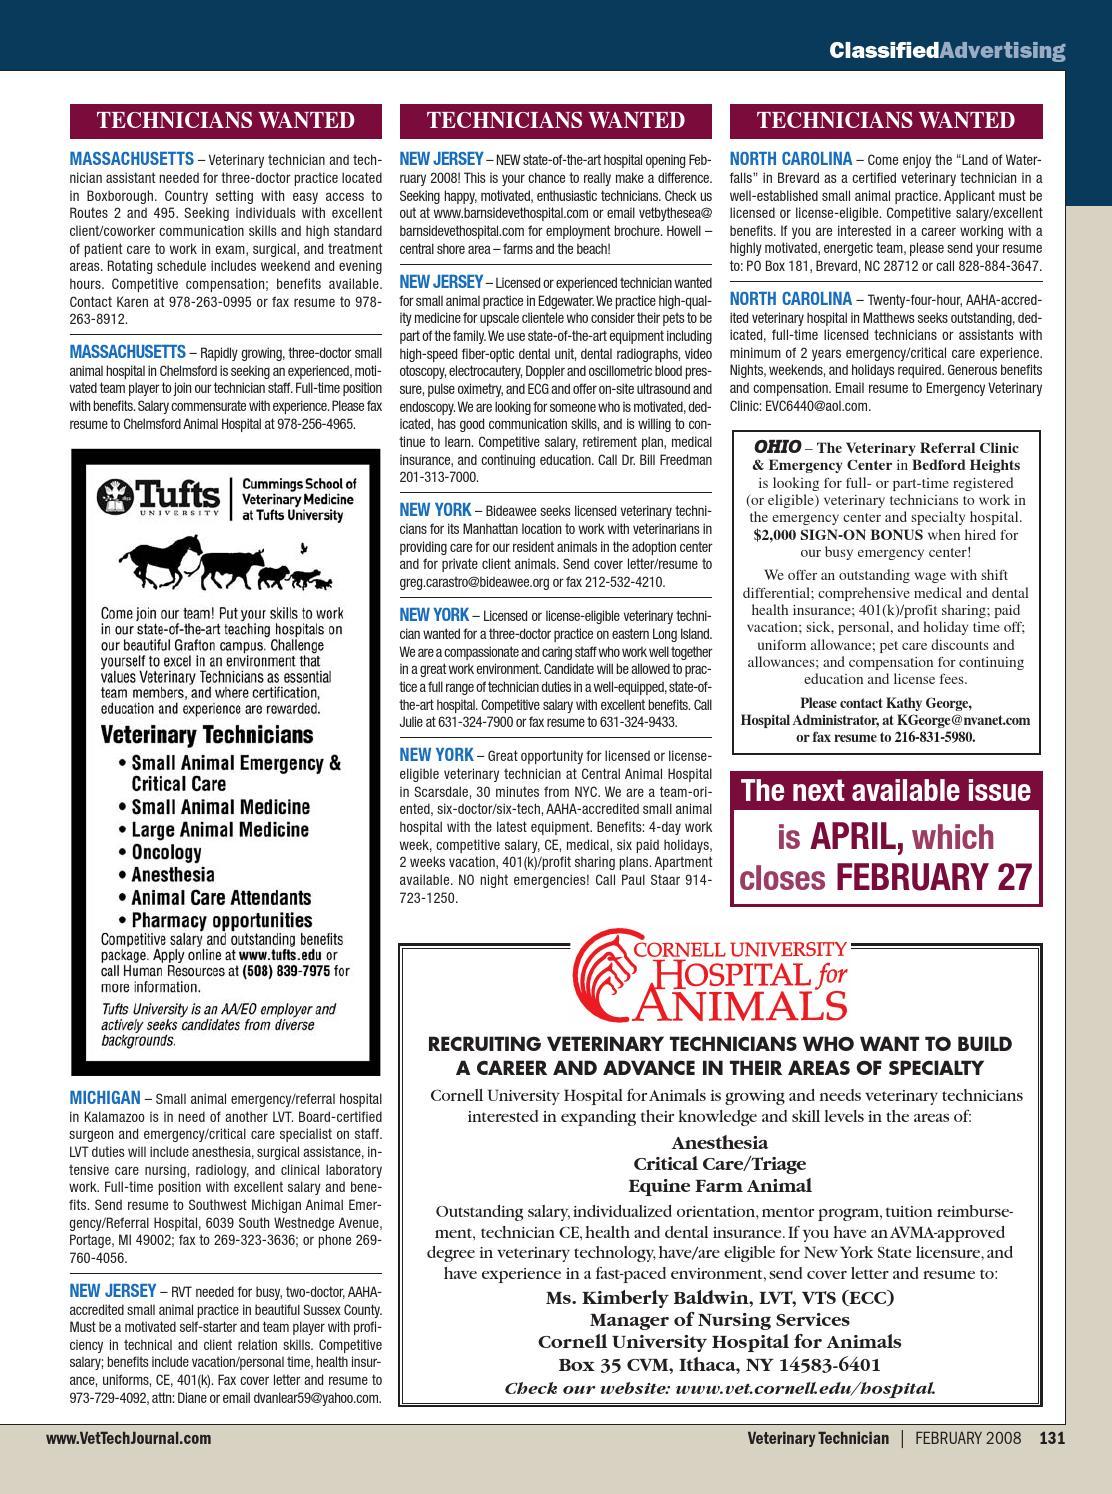 Veterinary Technician | February 2008 by davidpsu - issuu